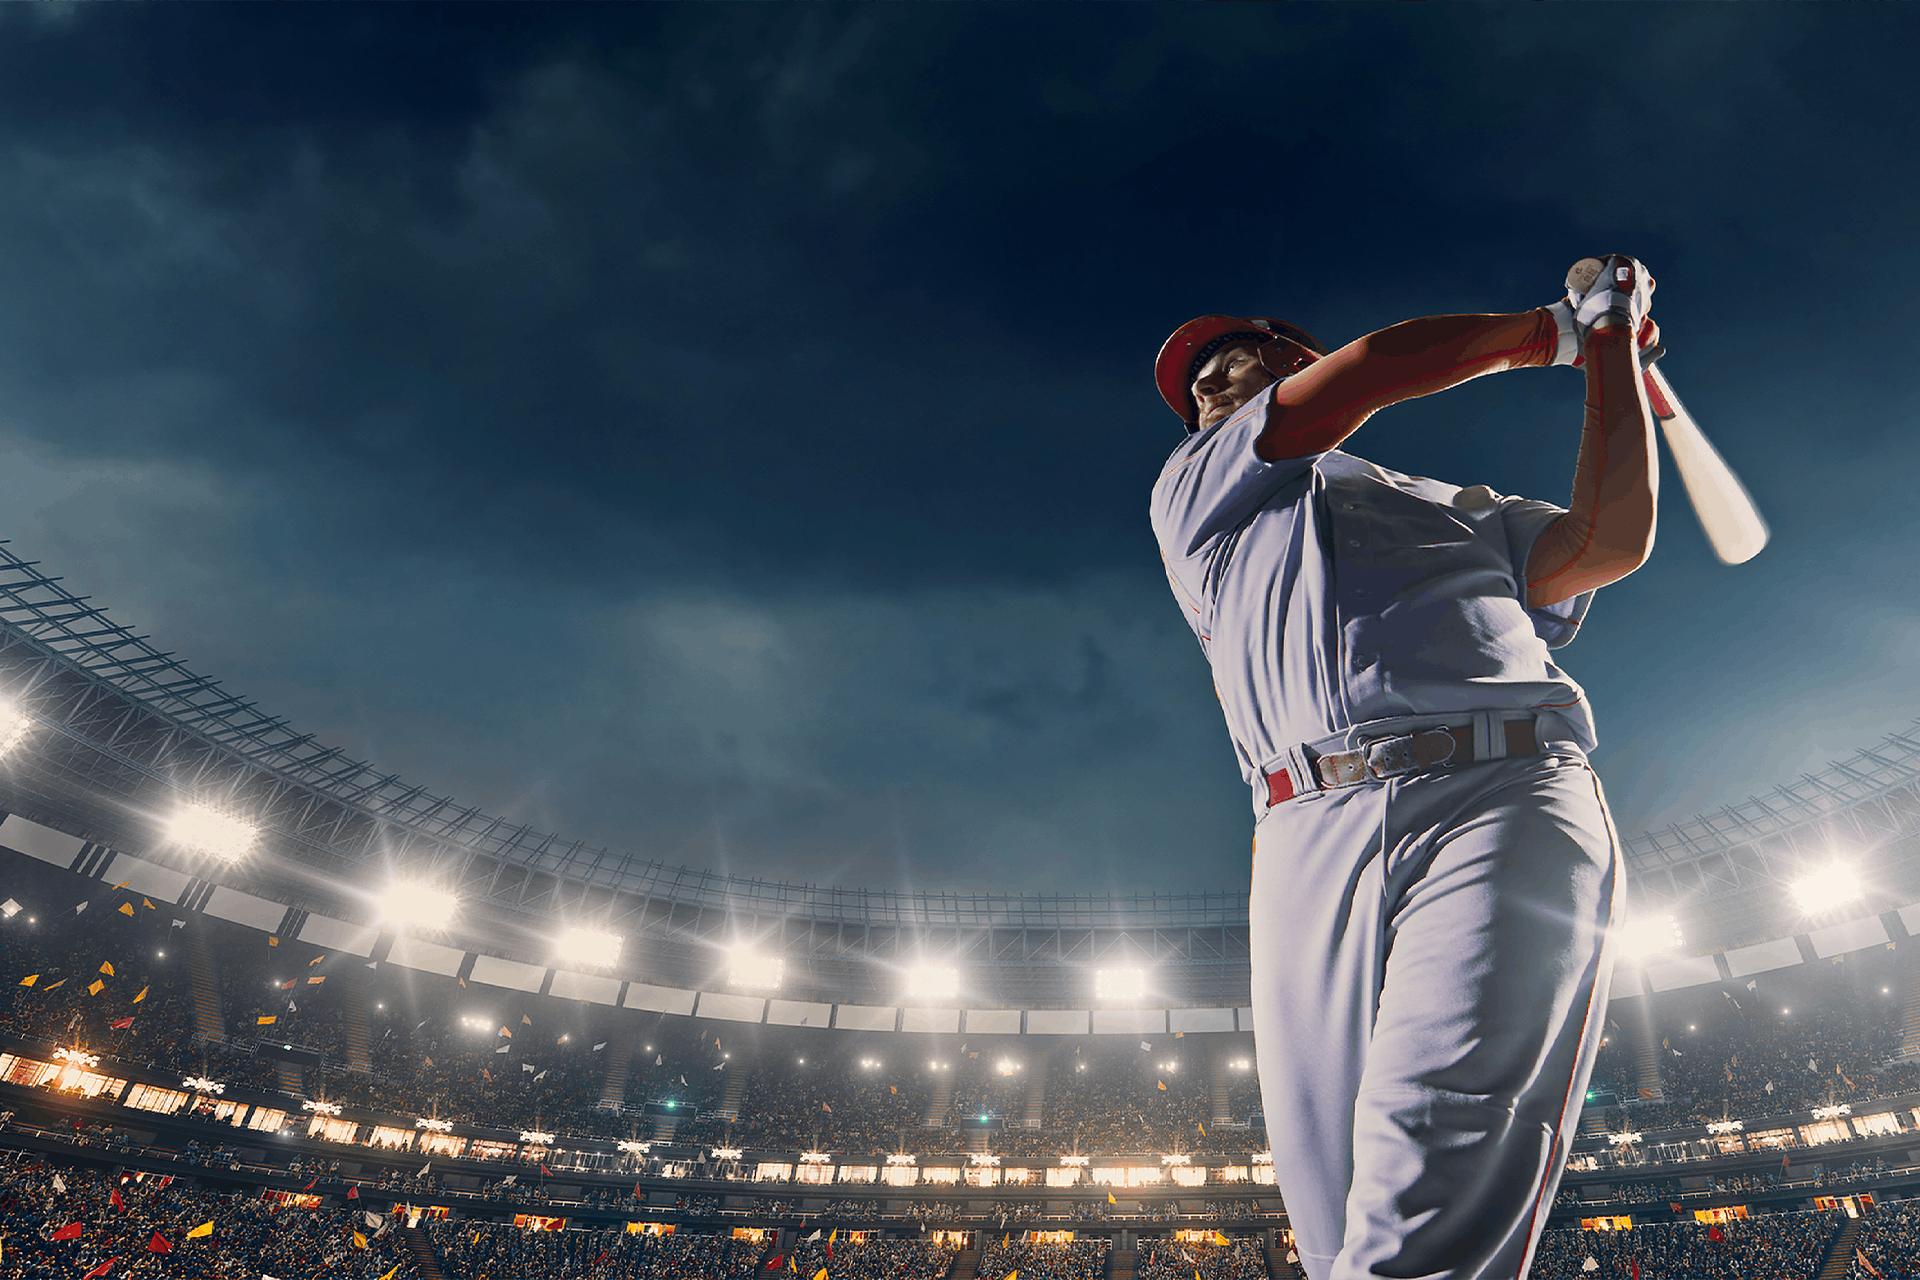 Foto Baseballspieler auf dem Feld im Stadium